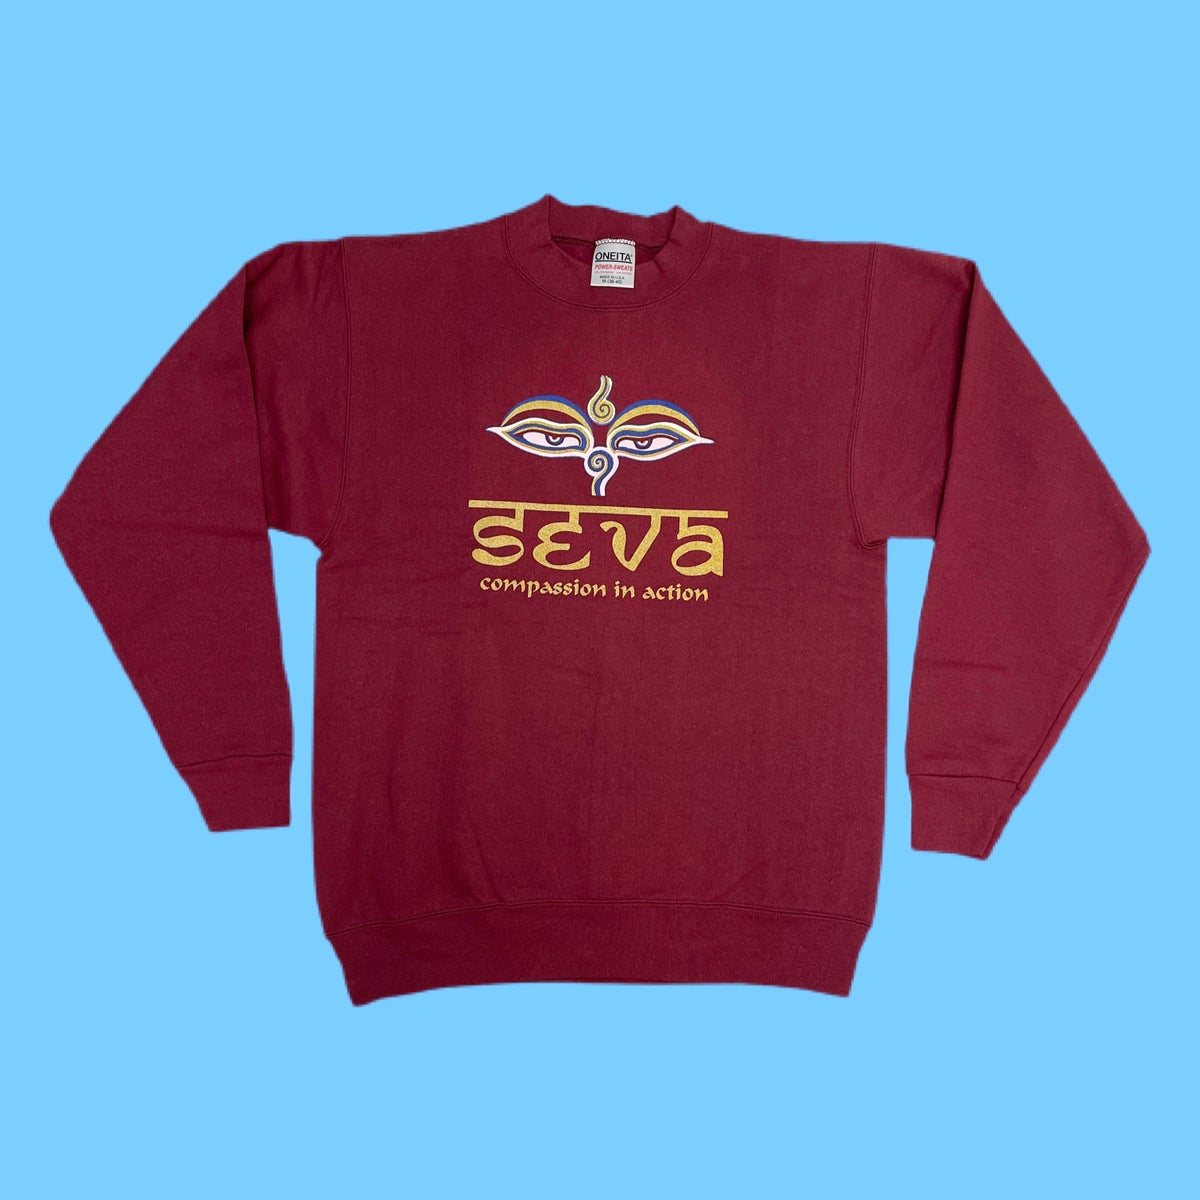 Original Vintage Grateful Dead 1990's Seva Long Sleeve Crewneck Sweatshirt!! - SMALL or MEDIUM